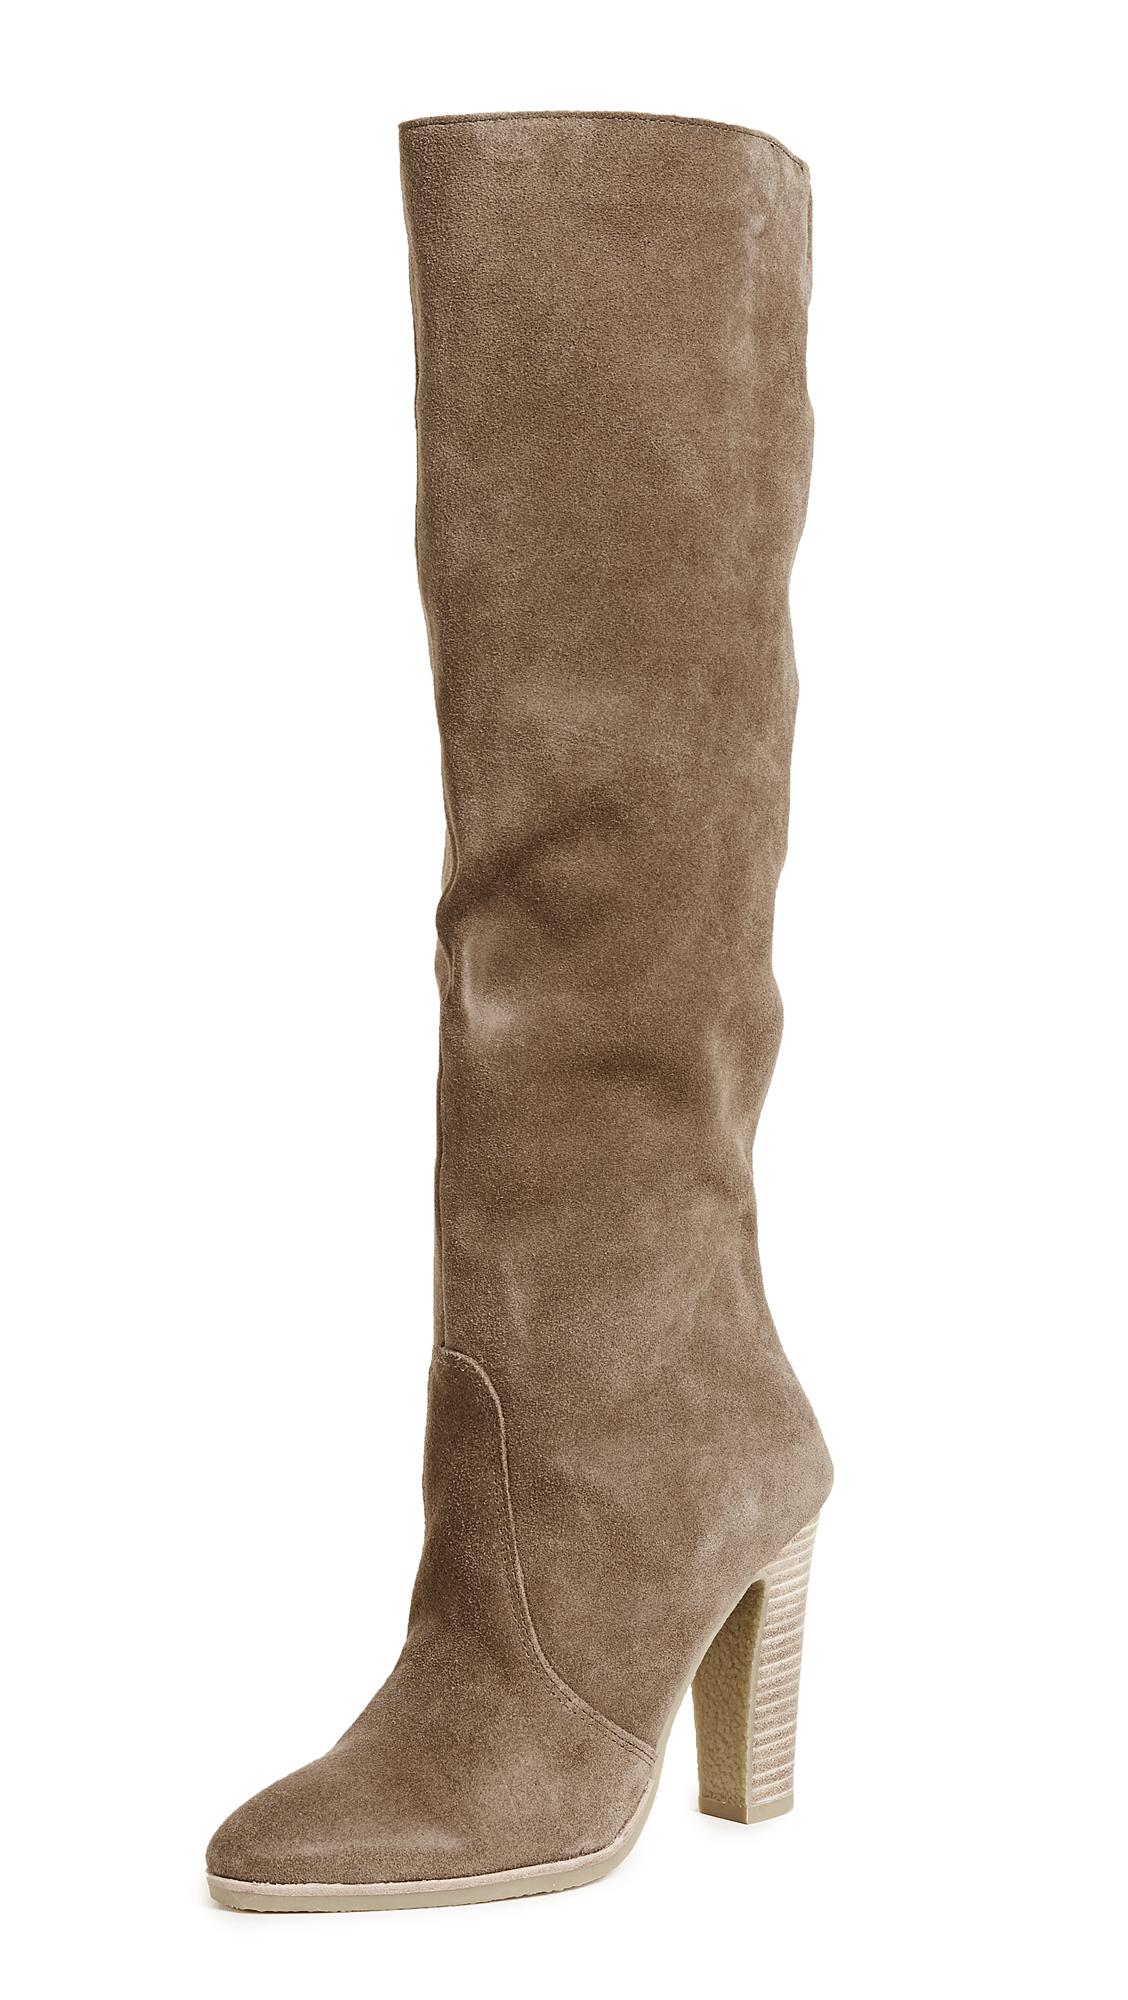 Dolce Vita Celine Knee High Stacked Heel Boots - Khaki